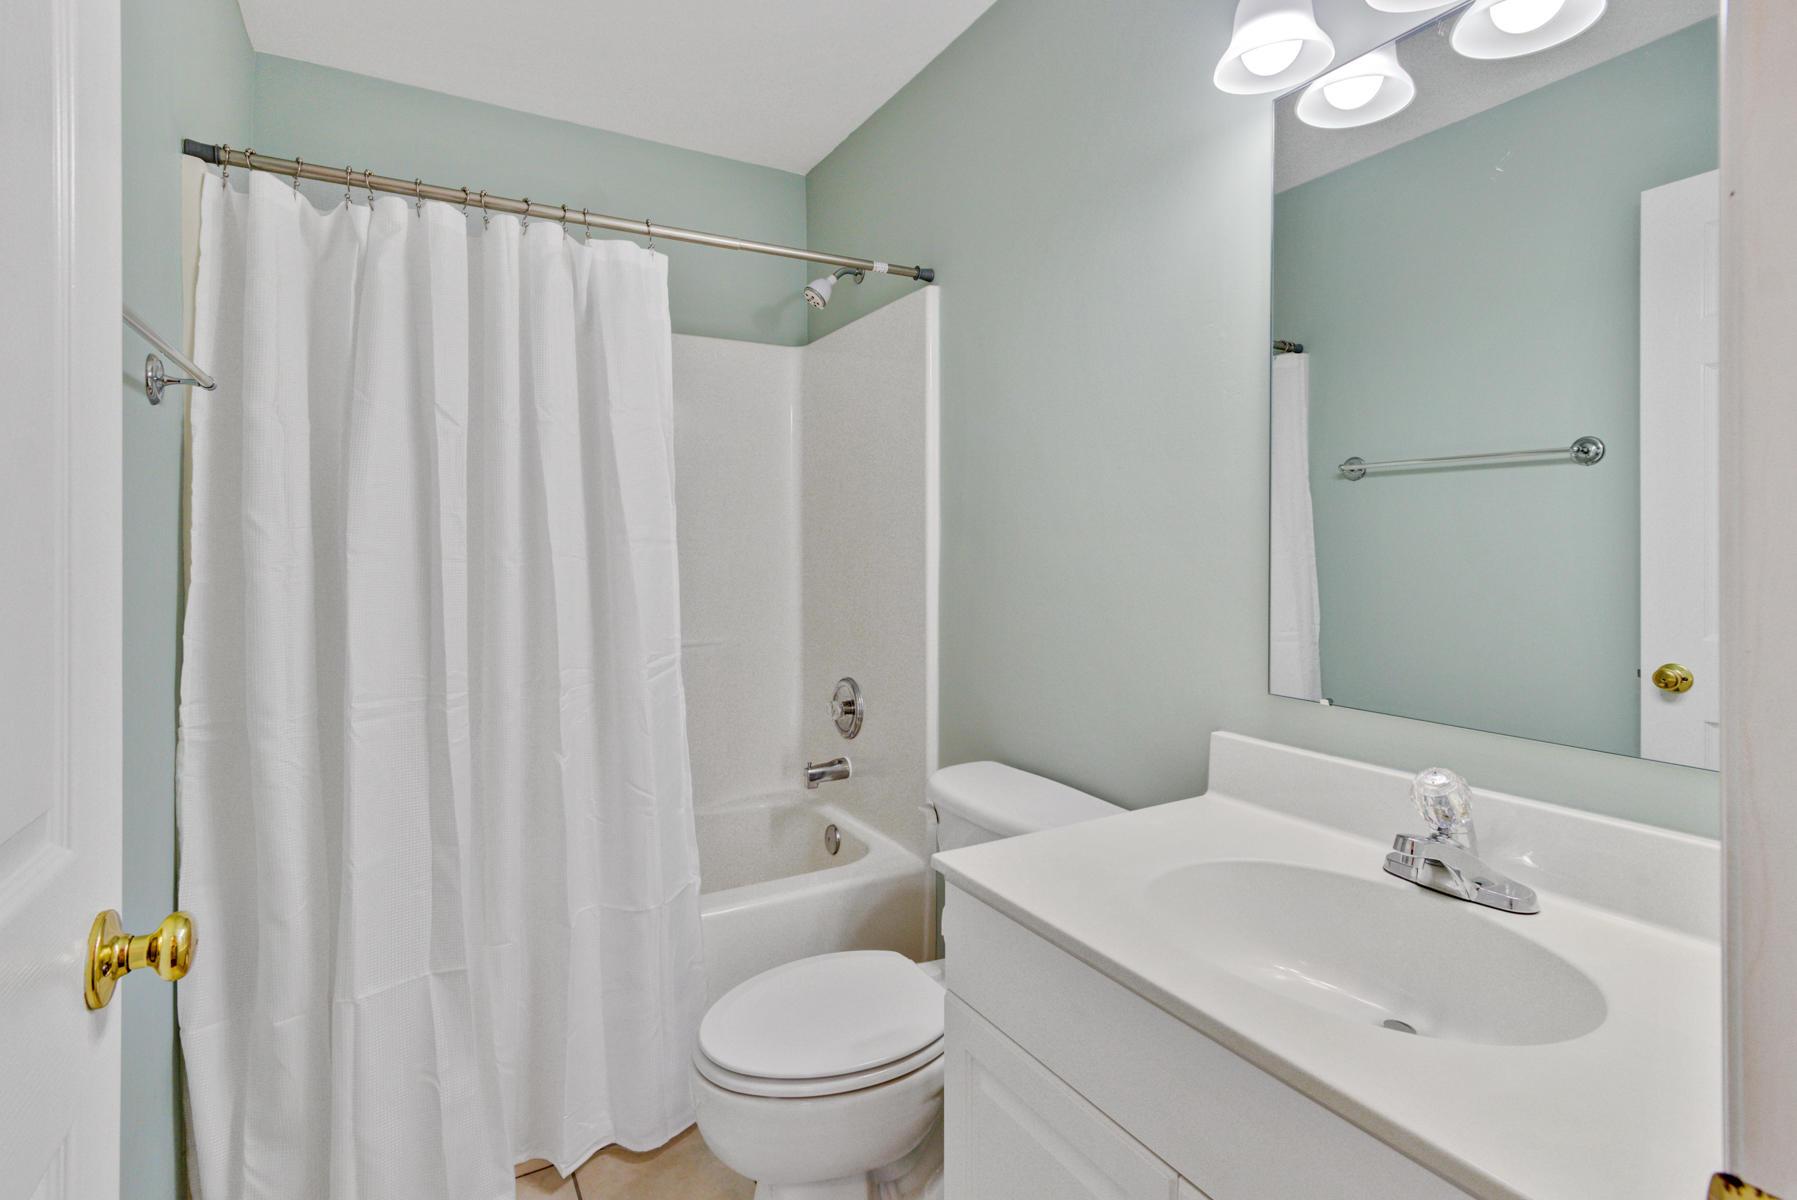 Park West Homes For Sale - 3444 Wellesley, Mount Pleasant, SC - 13